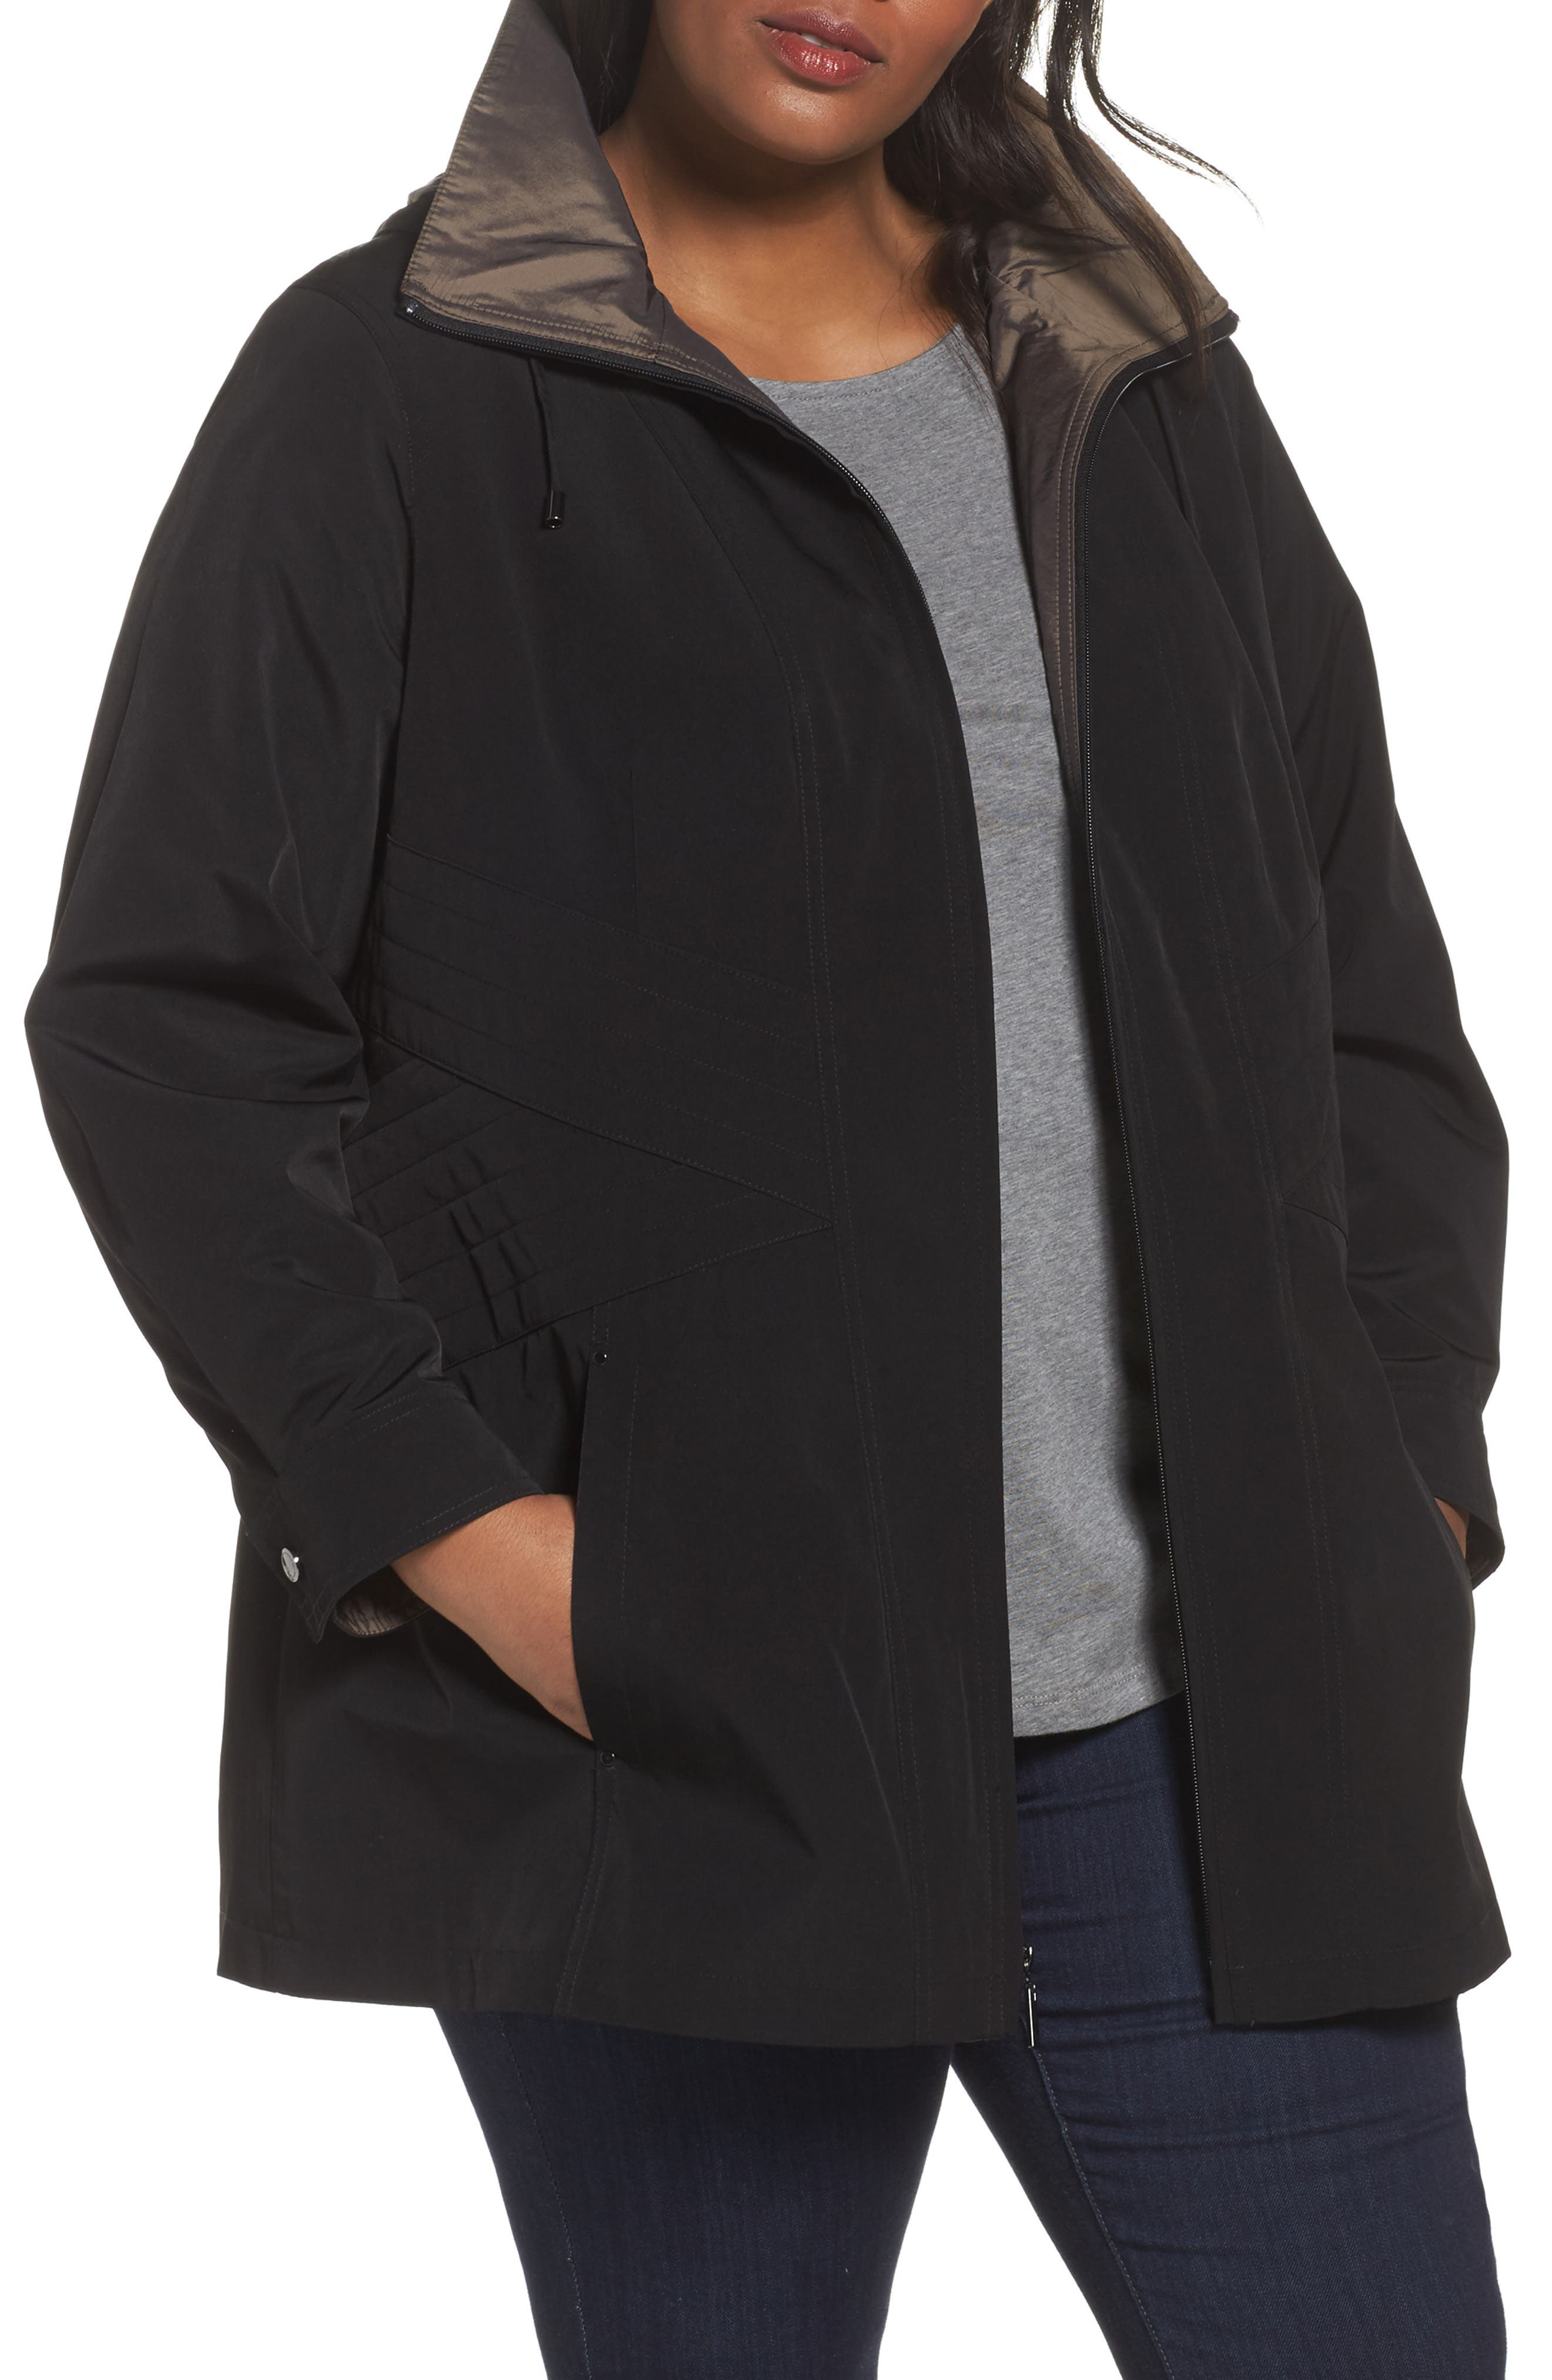 Alternate Image 1 Selected - Gallery Two-Tone Long Silk Look Raincoat (Plus Size)